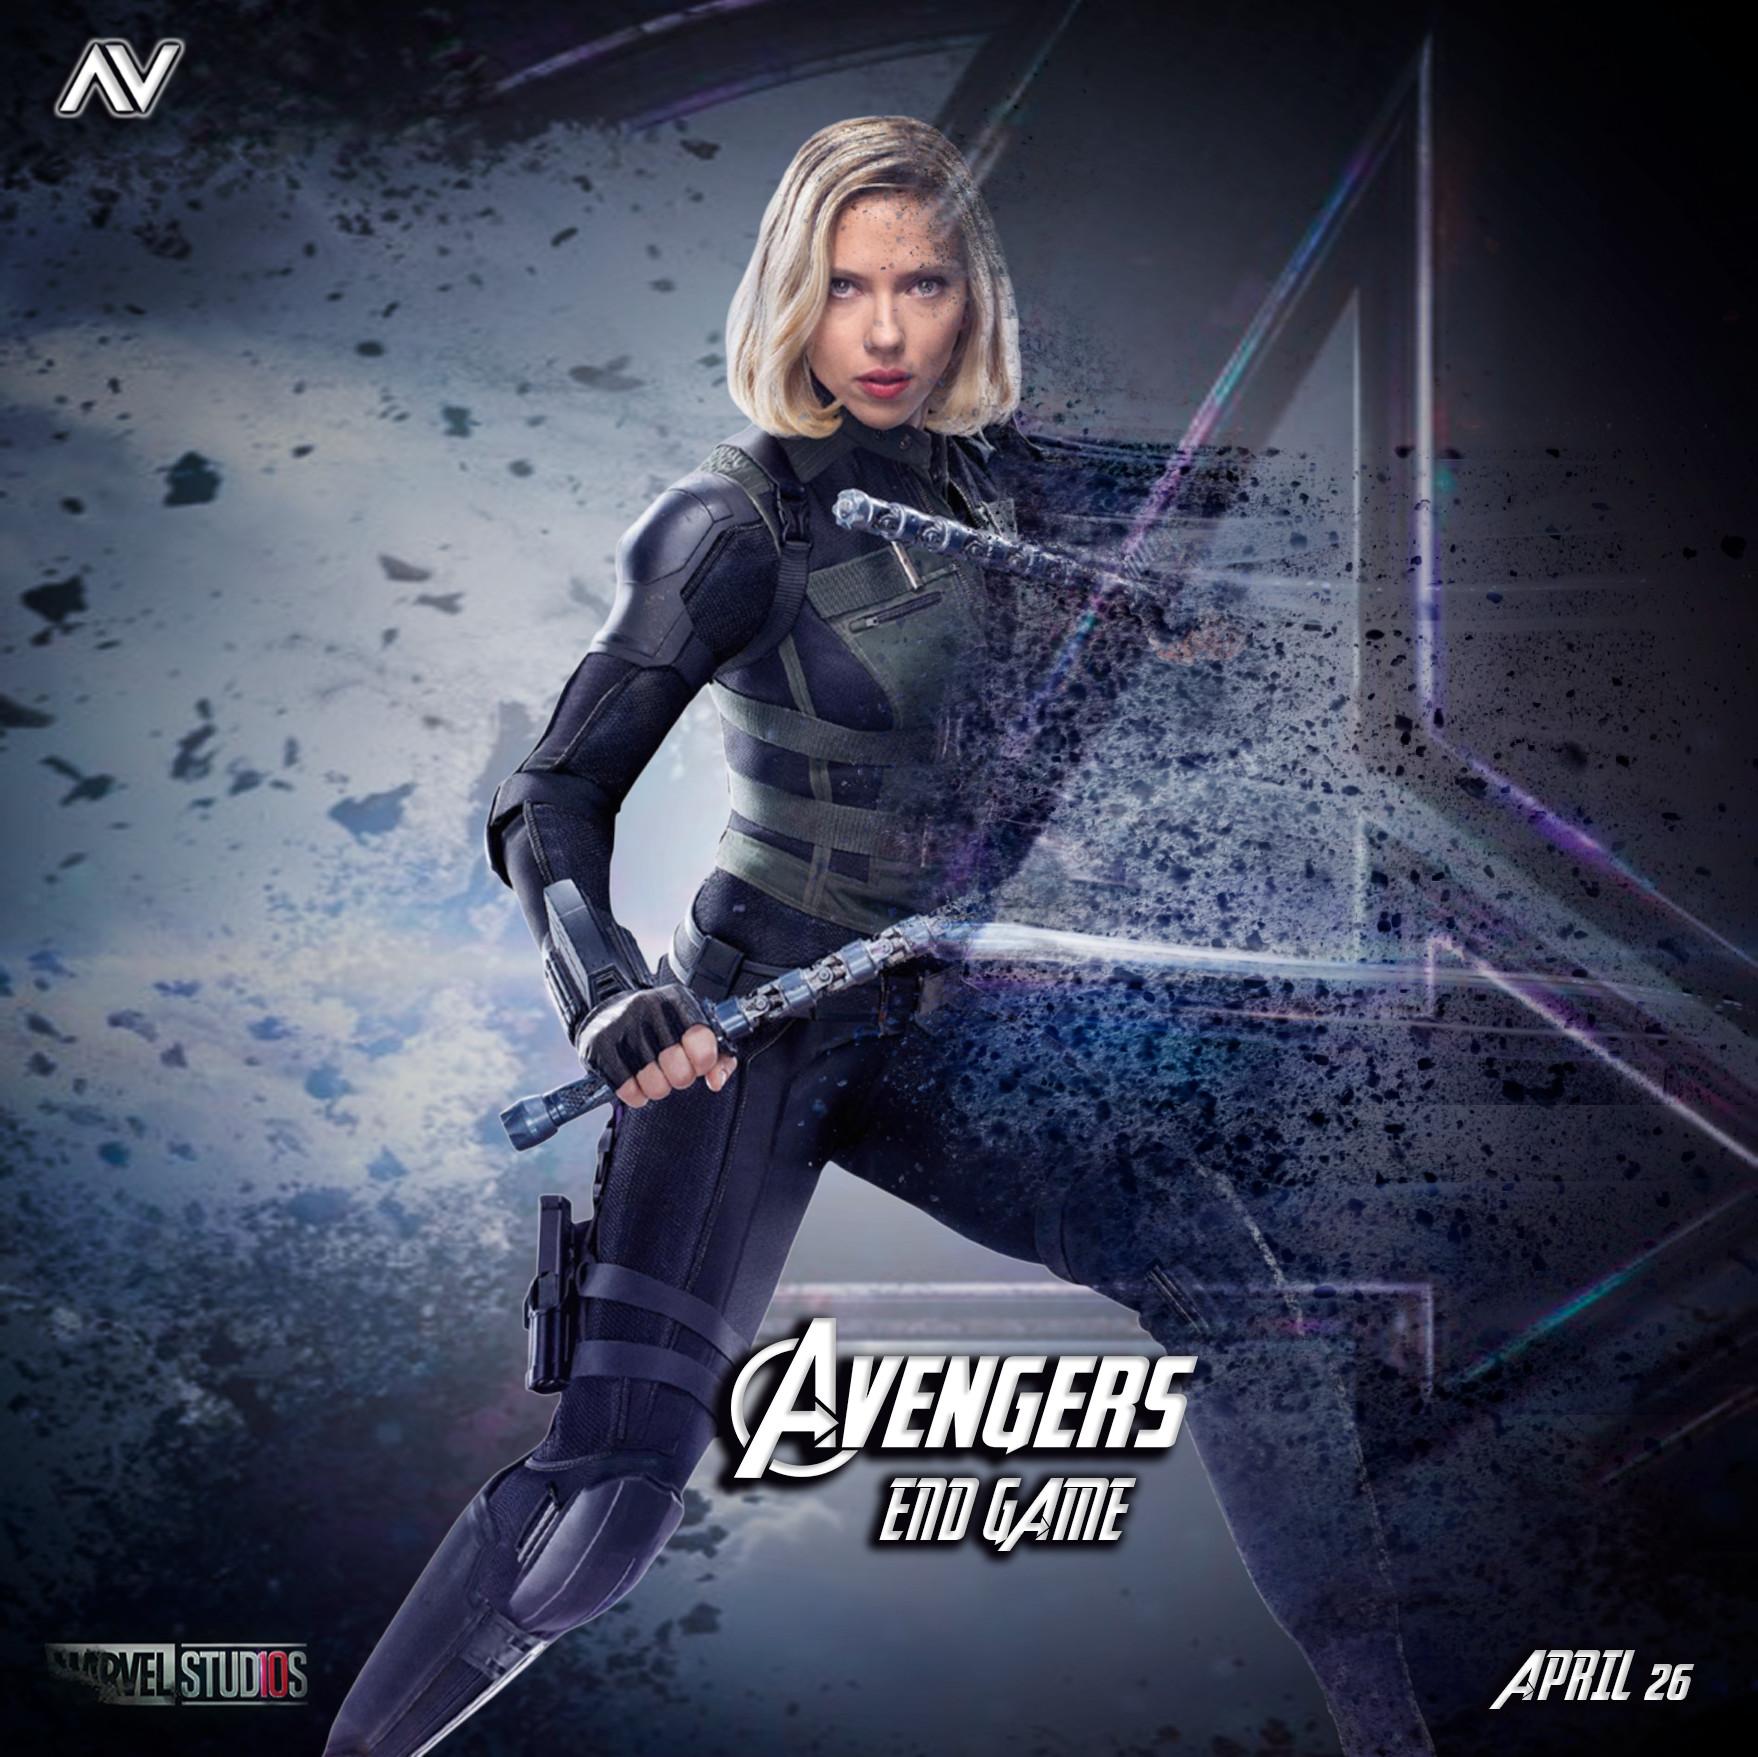 Avengers Endgame Black Widow Hd Wallpaper